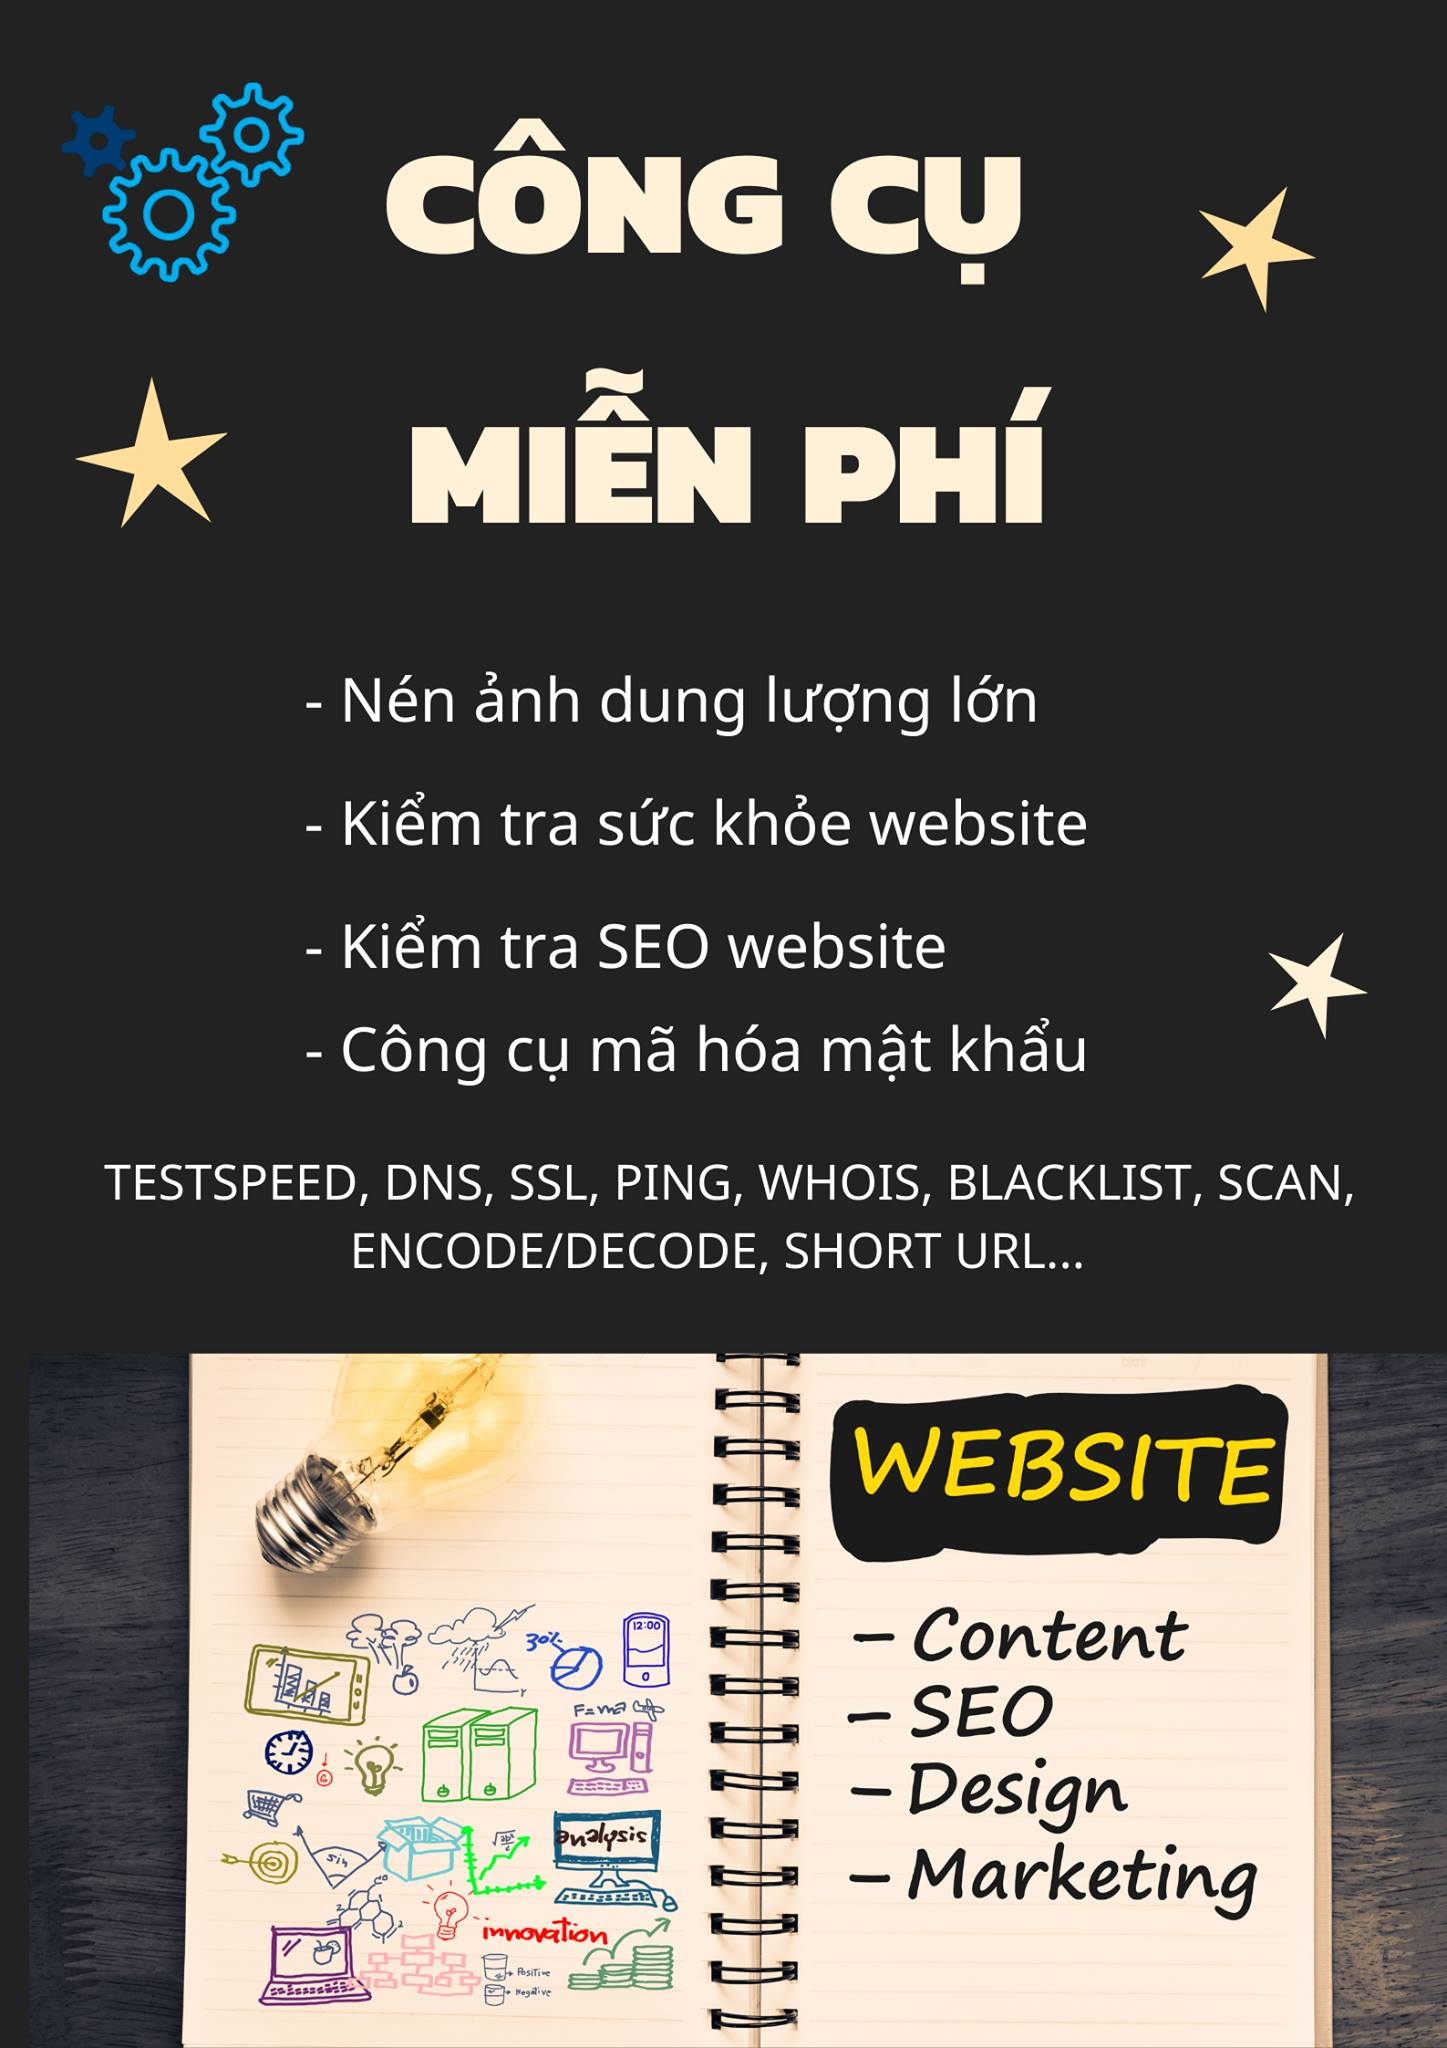 Công cụ kiểm tra website từ A - Z : Seo website hiệu quả